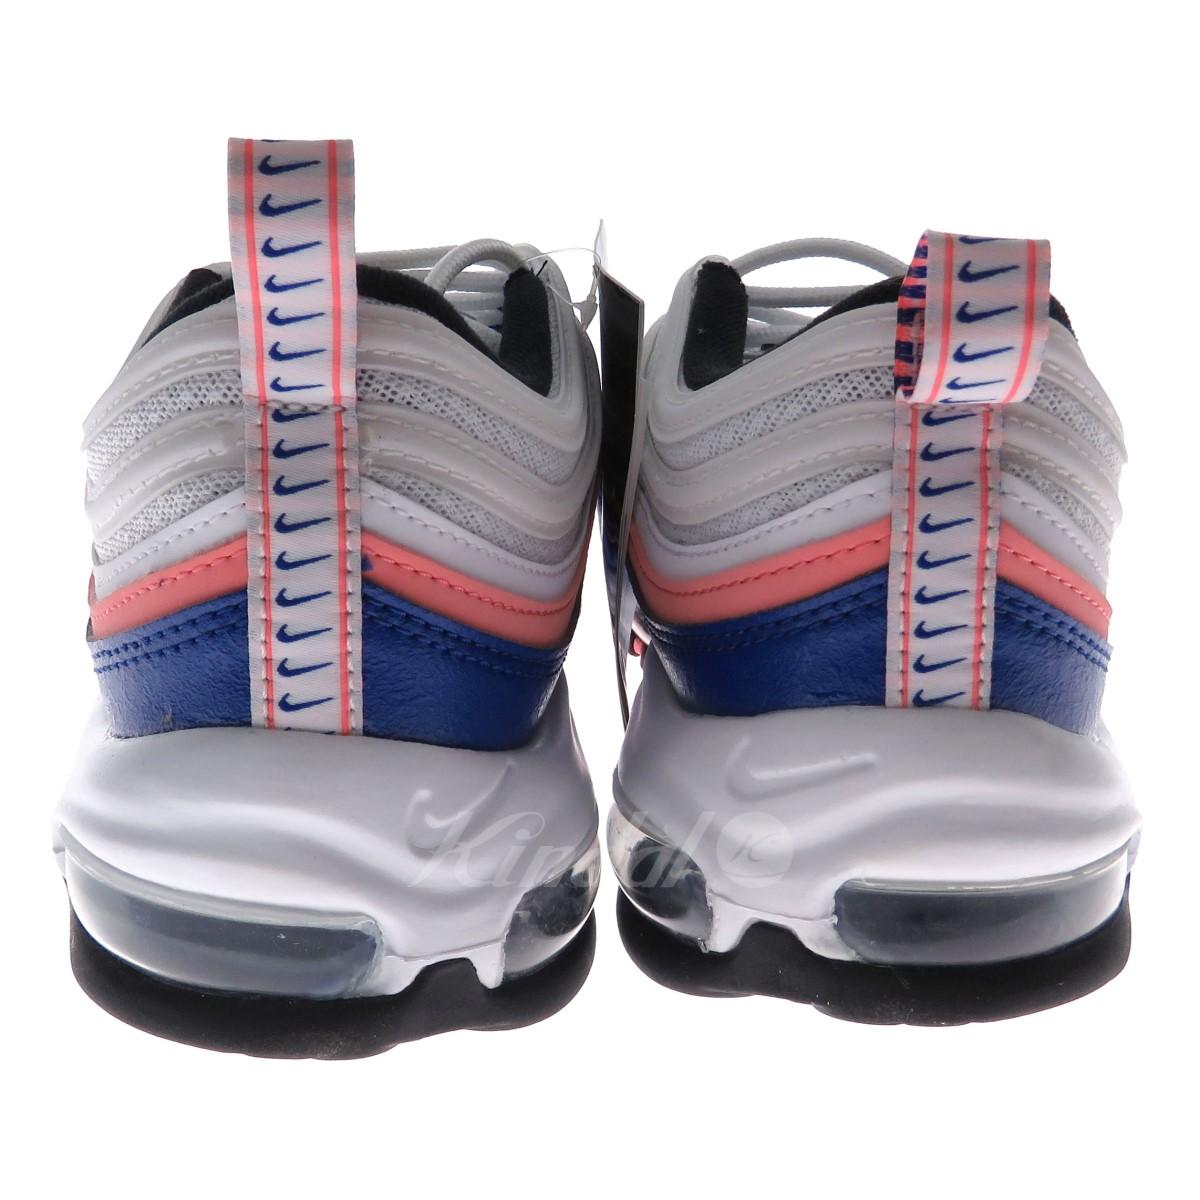 NIKE [Nike air force 1 high '07 エレベイト 2 Nike sportswear limited edition]  AIR FORCE 1 HIGH '07 LV8 2